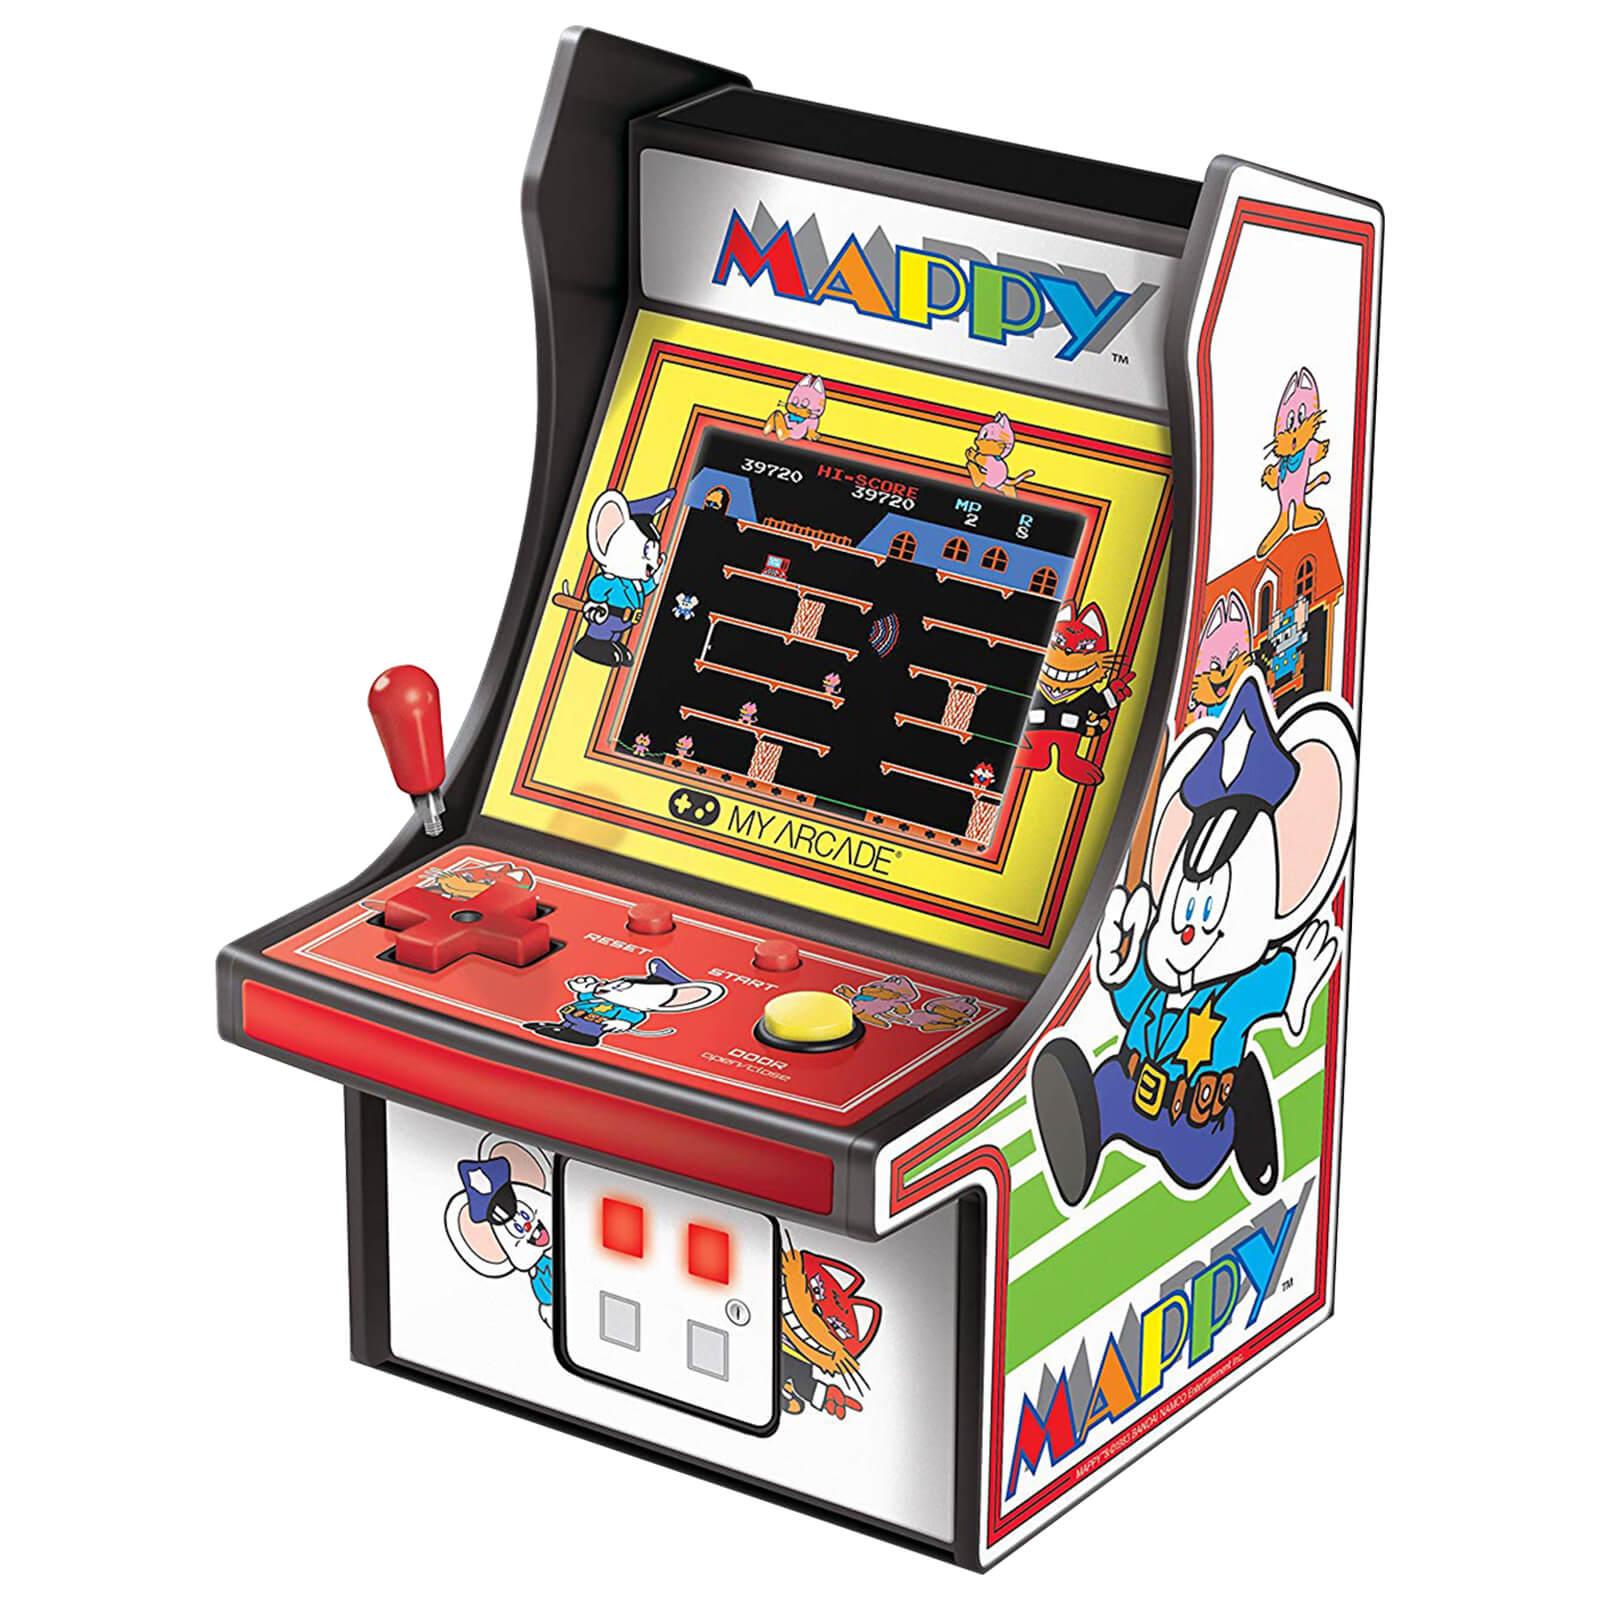 Image of DreamGear Retro Arcade 6 Inch Mappy Micro Player